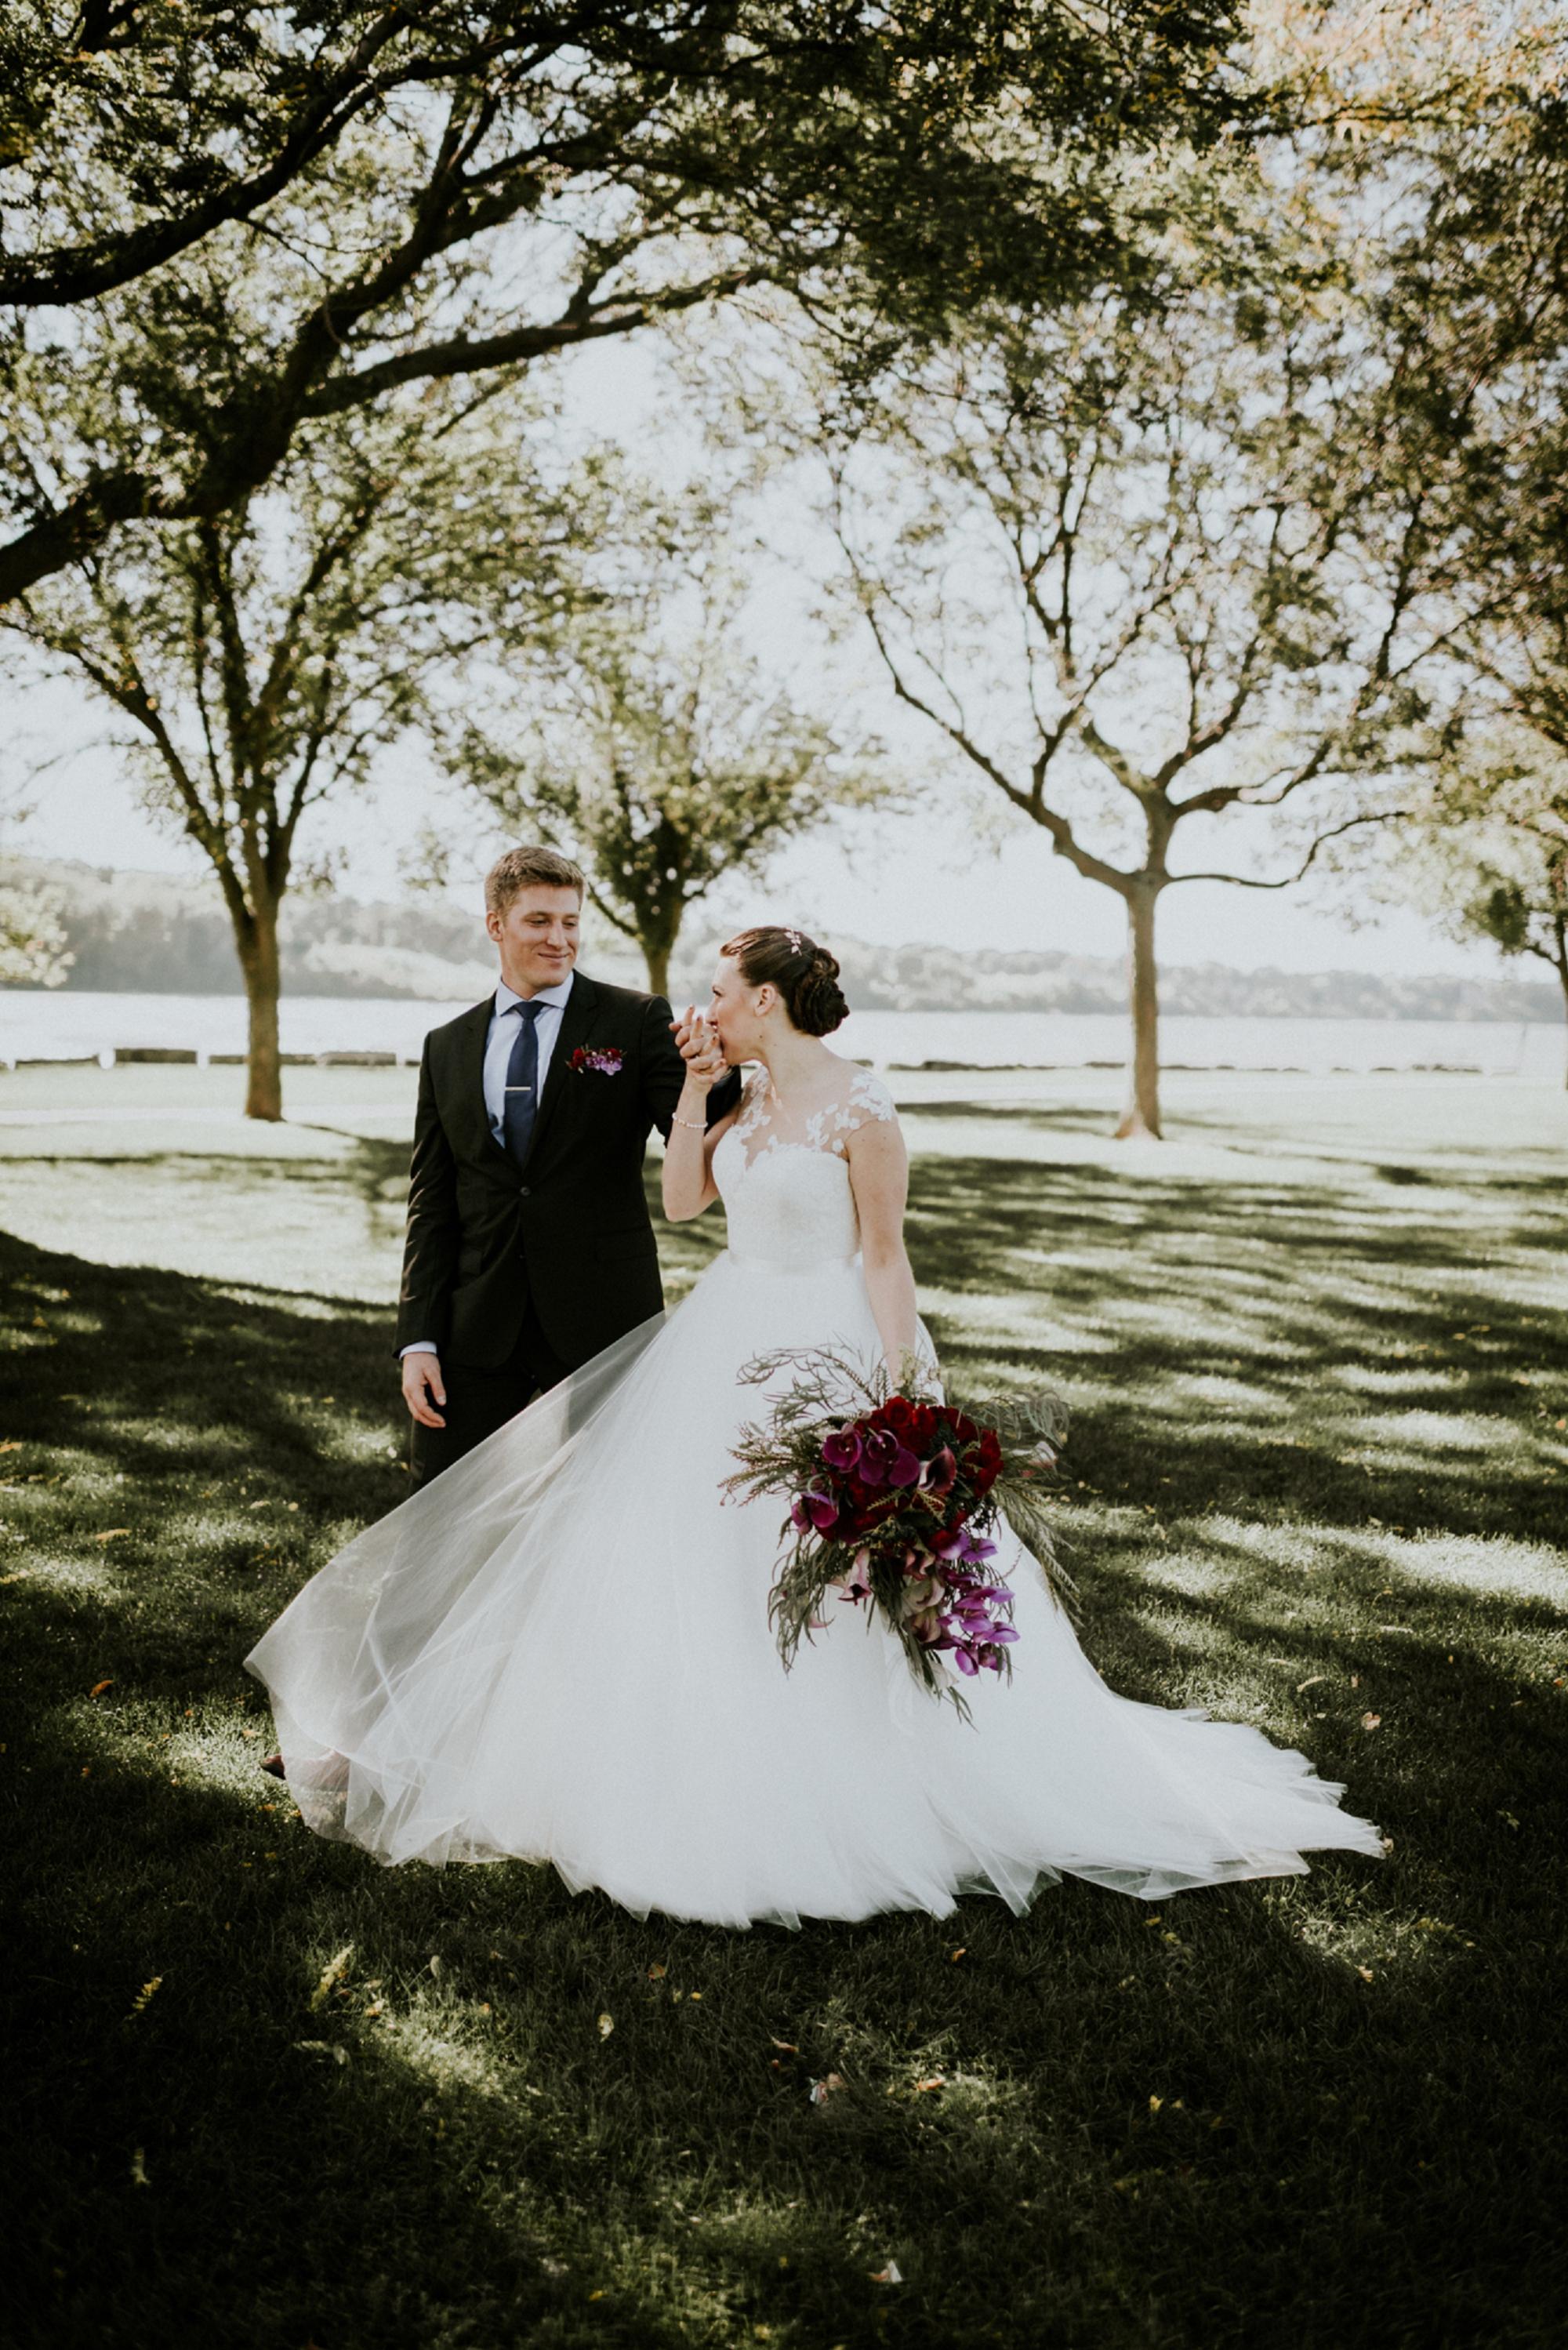 Romantic-Industrial-Warehouse-Wedding_Mallory+Justin-Photographers_0179.jpg